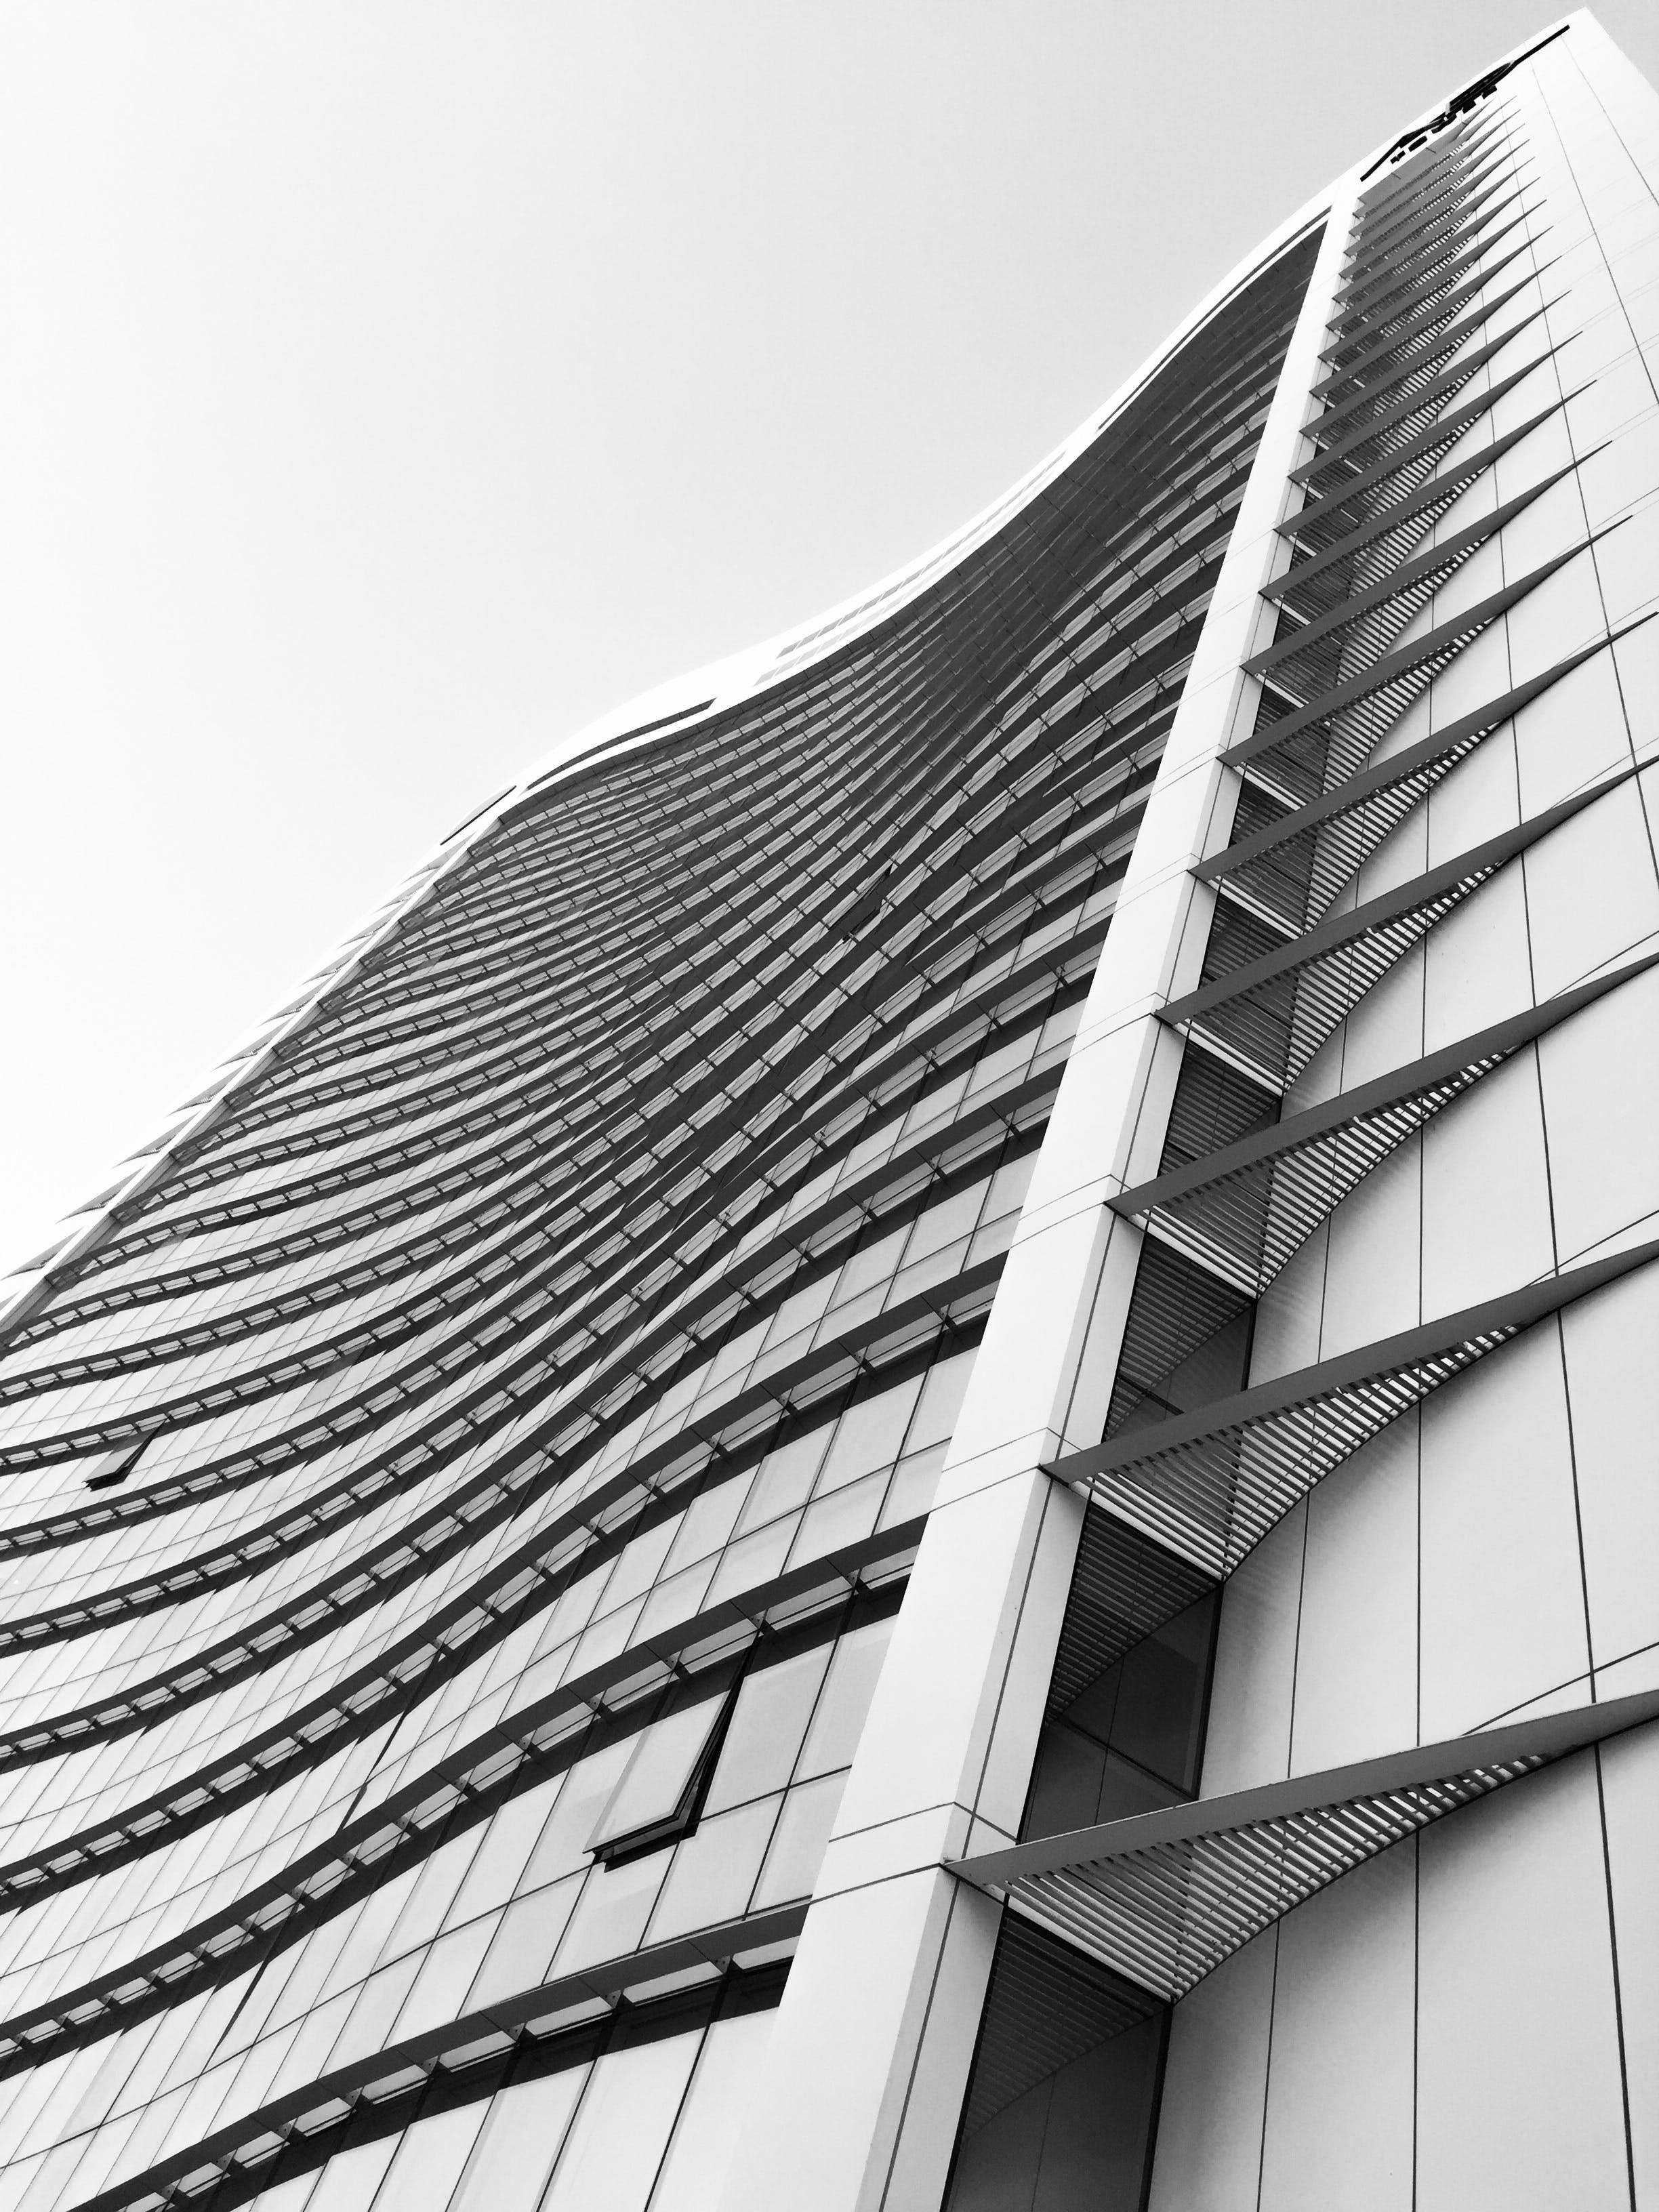 arkitektur, bygning, højhus